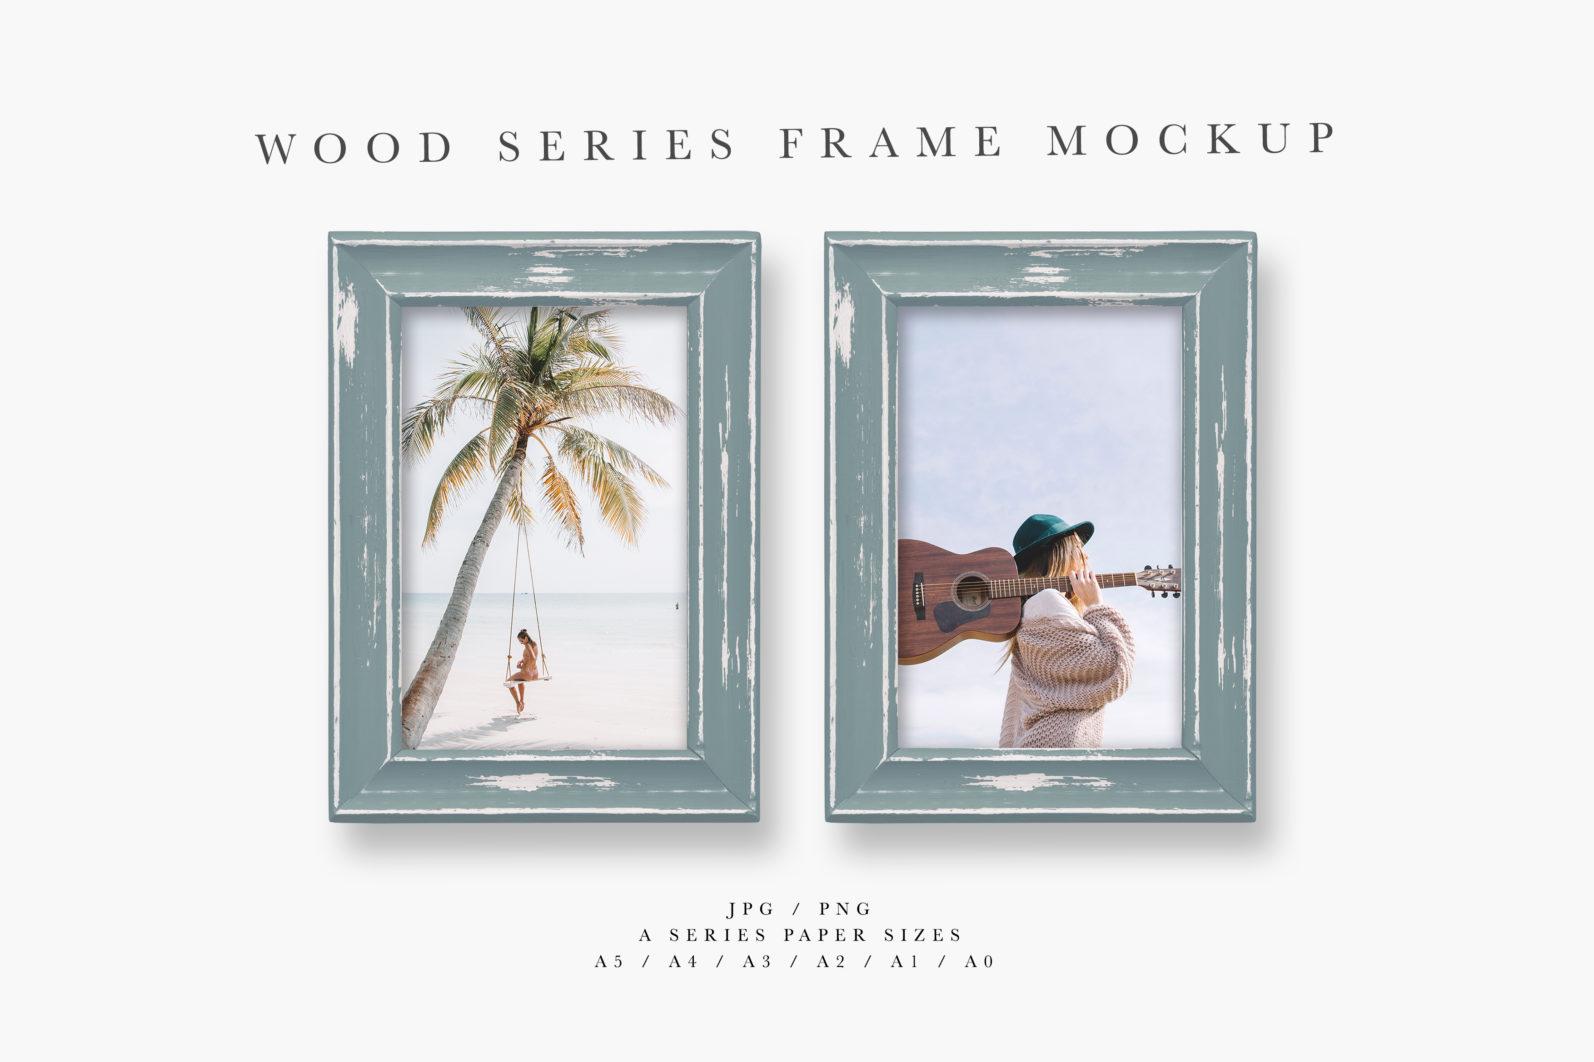 Frame Mockup, Blue Wood Portrait Photo Frame, Two Frame Mockup, PSD - Wood Series 1 Preview 1 scaled -